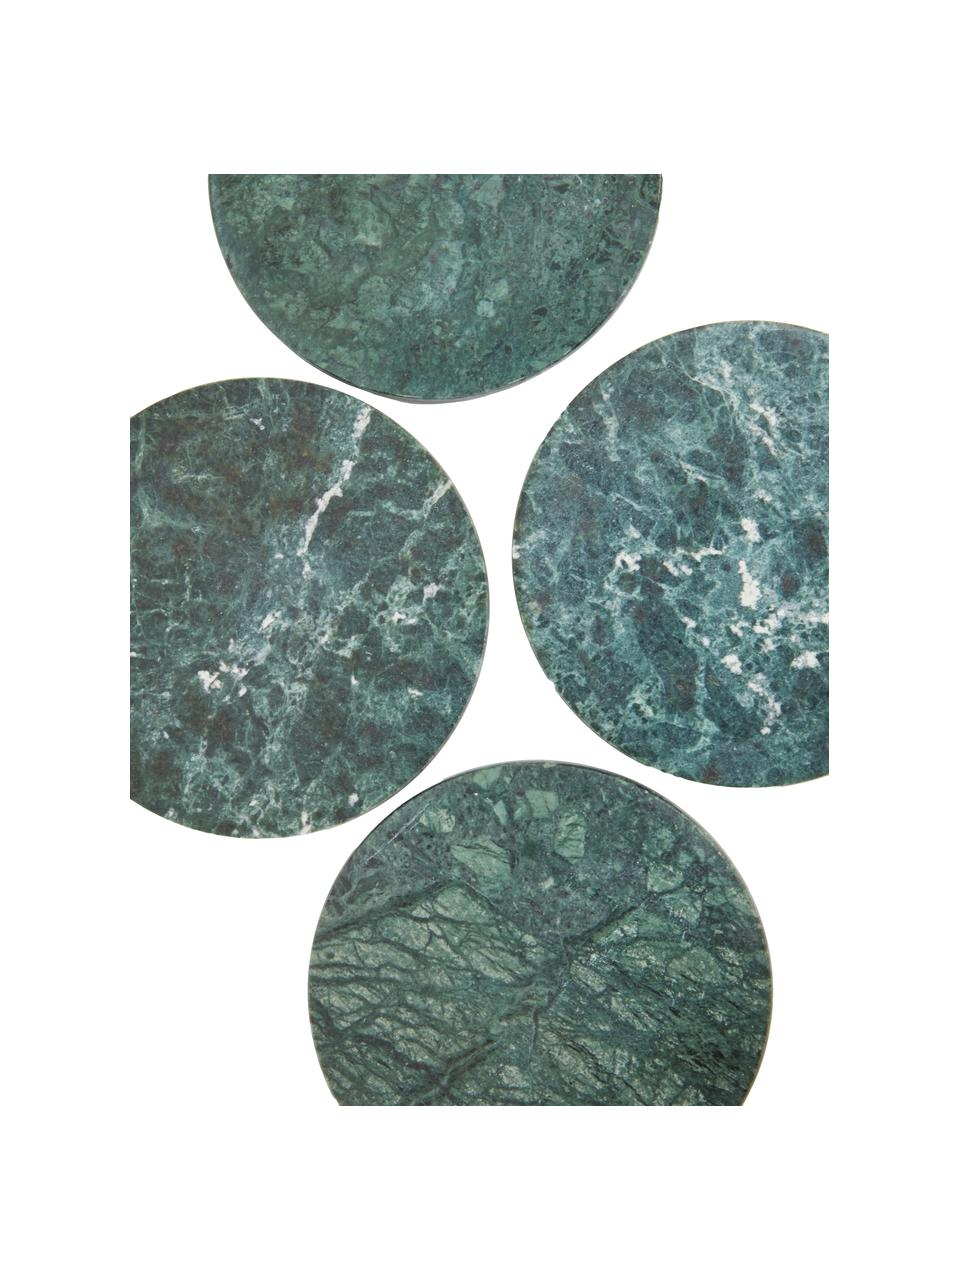 Marmor-Untersetzer Tressa in Grün, 4 Stück, Marmor, Grün, marmoriert, Ø 10 x H 1 cm